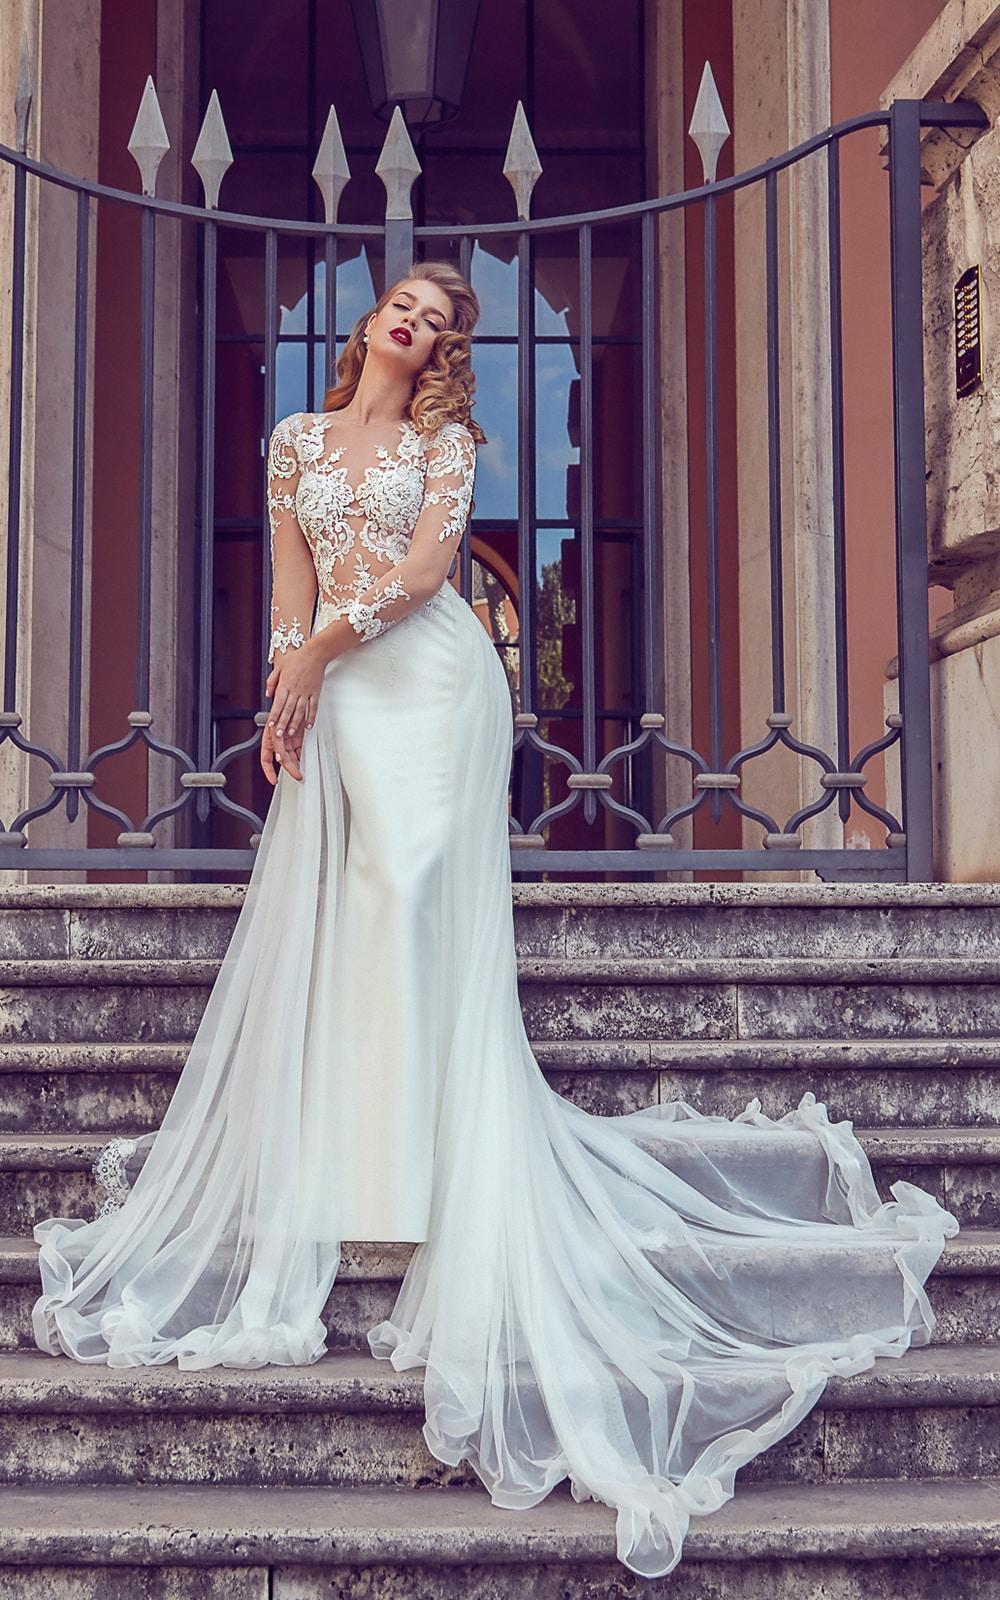 Naomi Model - Colectia Roma - Adora Sposa